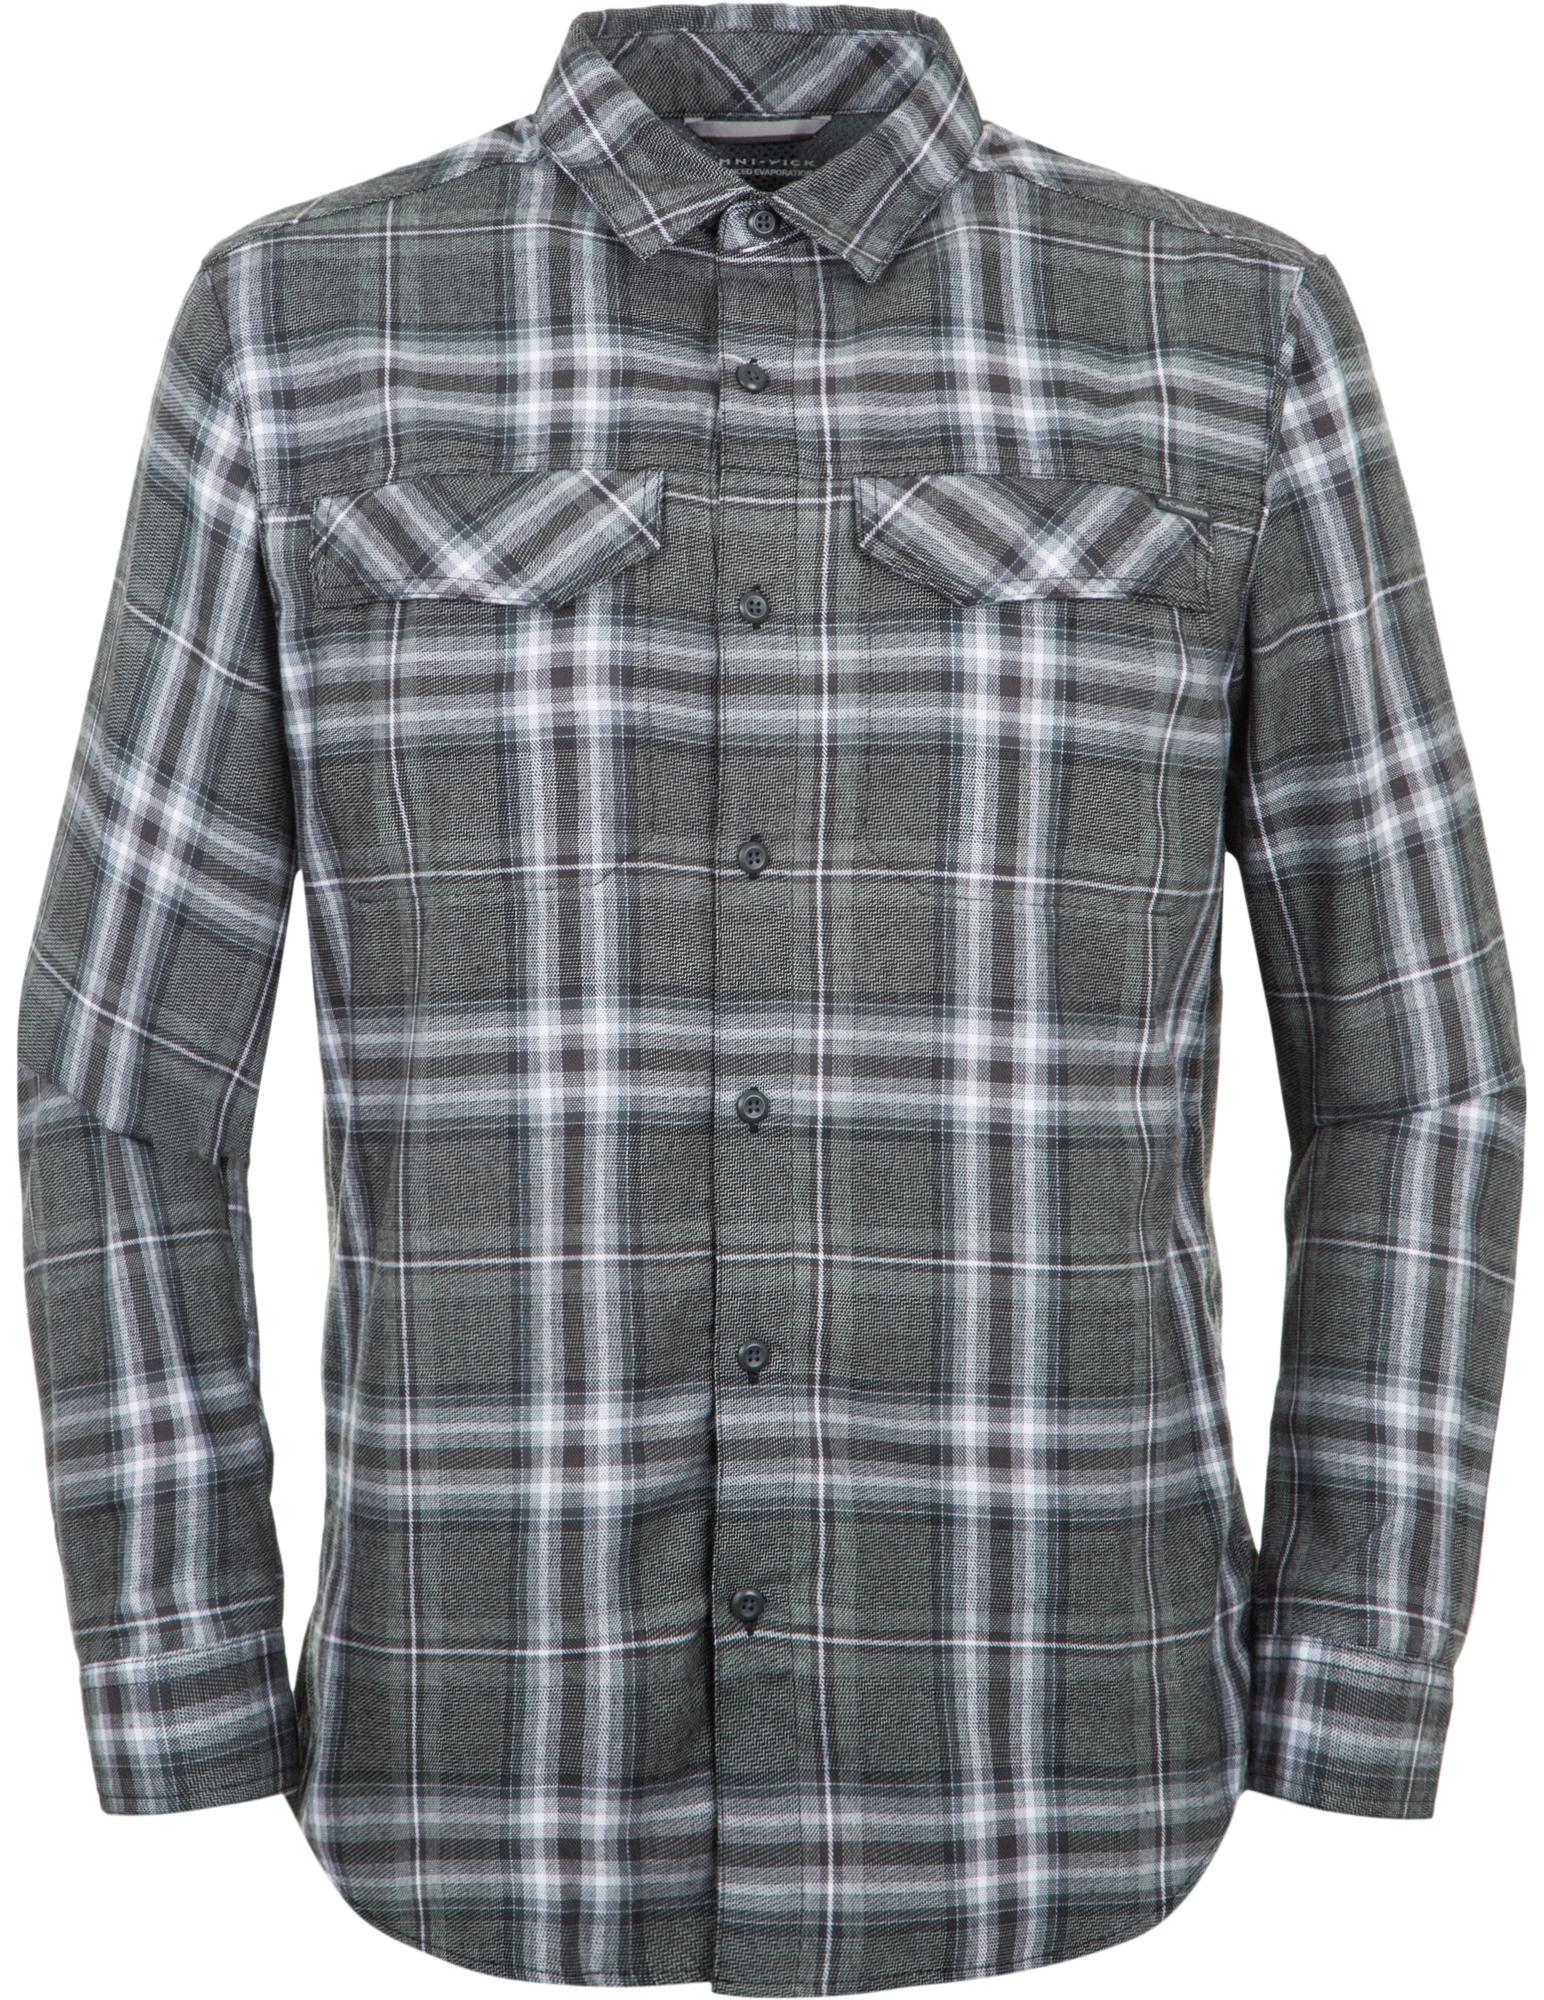 Columbia Рубашка с длинным рукавом мужская Columbia Silver Ridge, размер 44-46